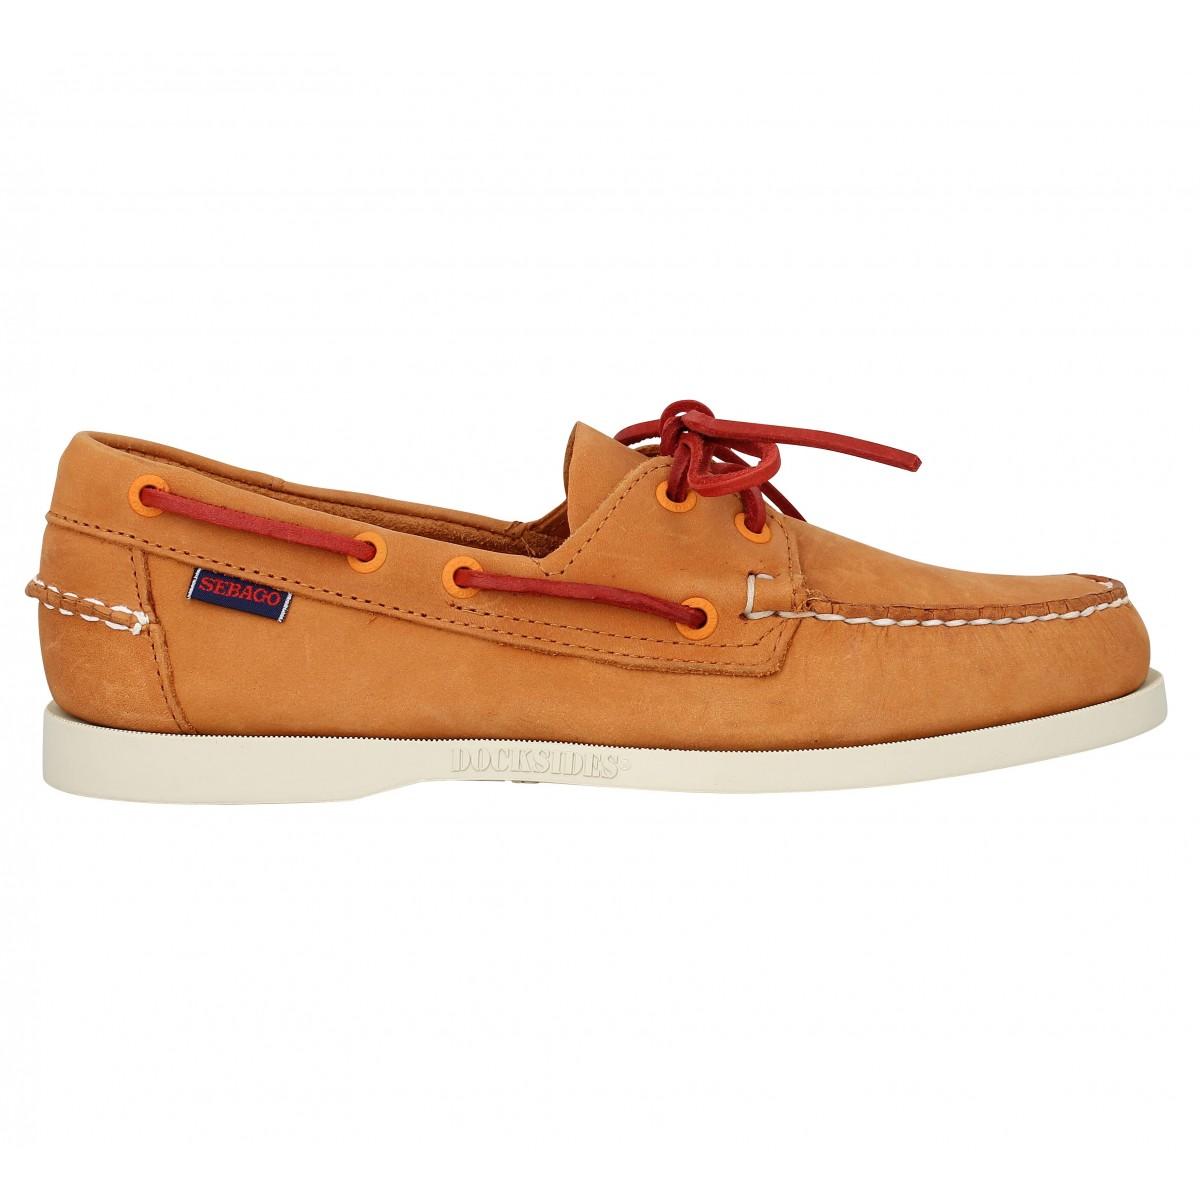 SEBAGO Docksides velours-40-Orange SGTMWo